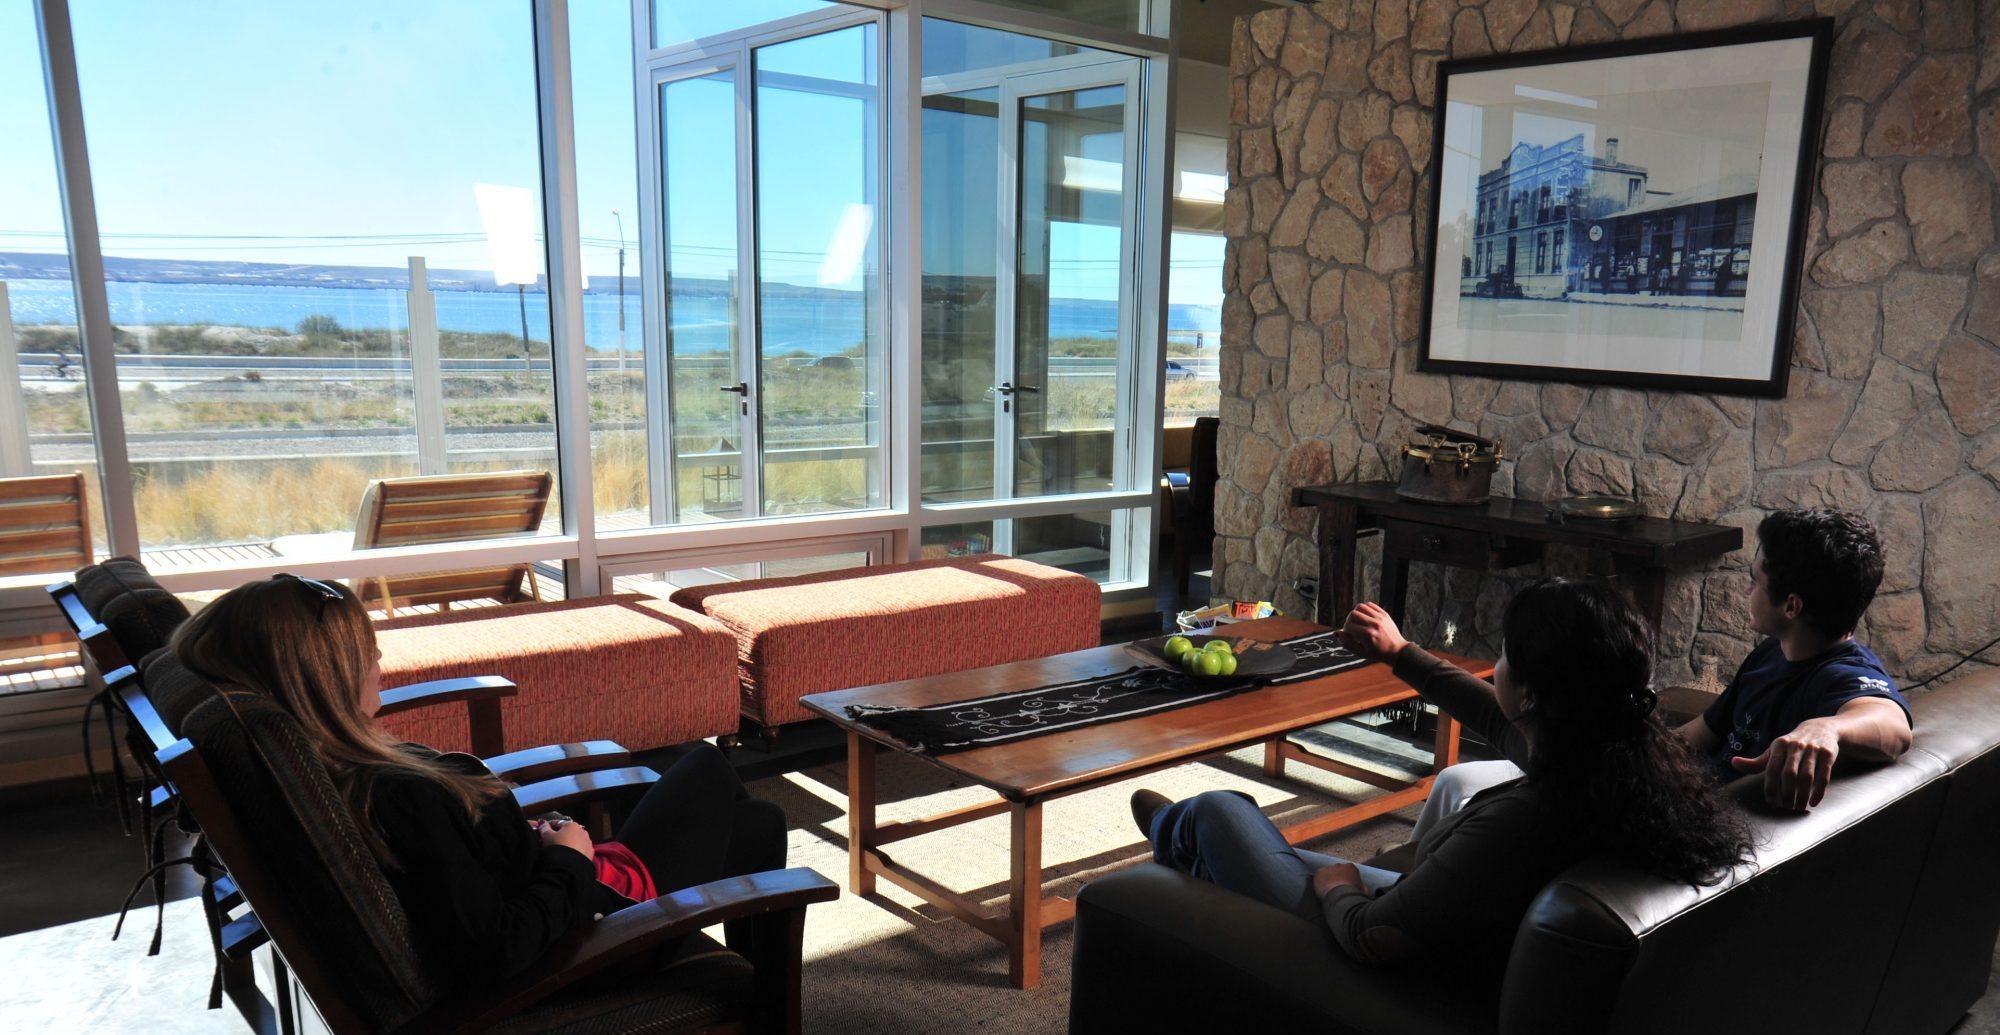 Alojamientos Puerto Madryn